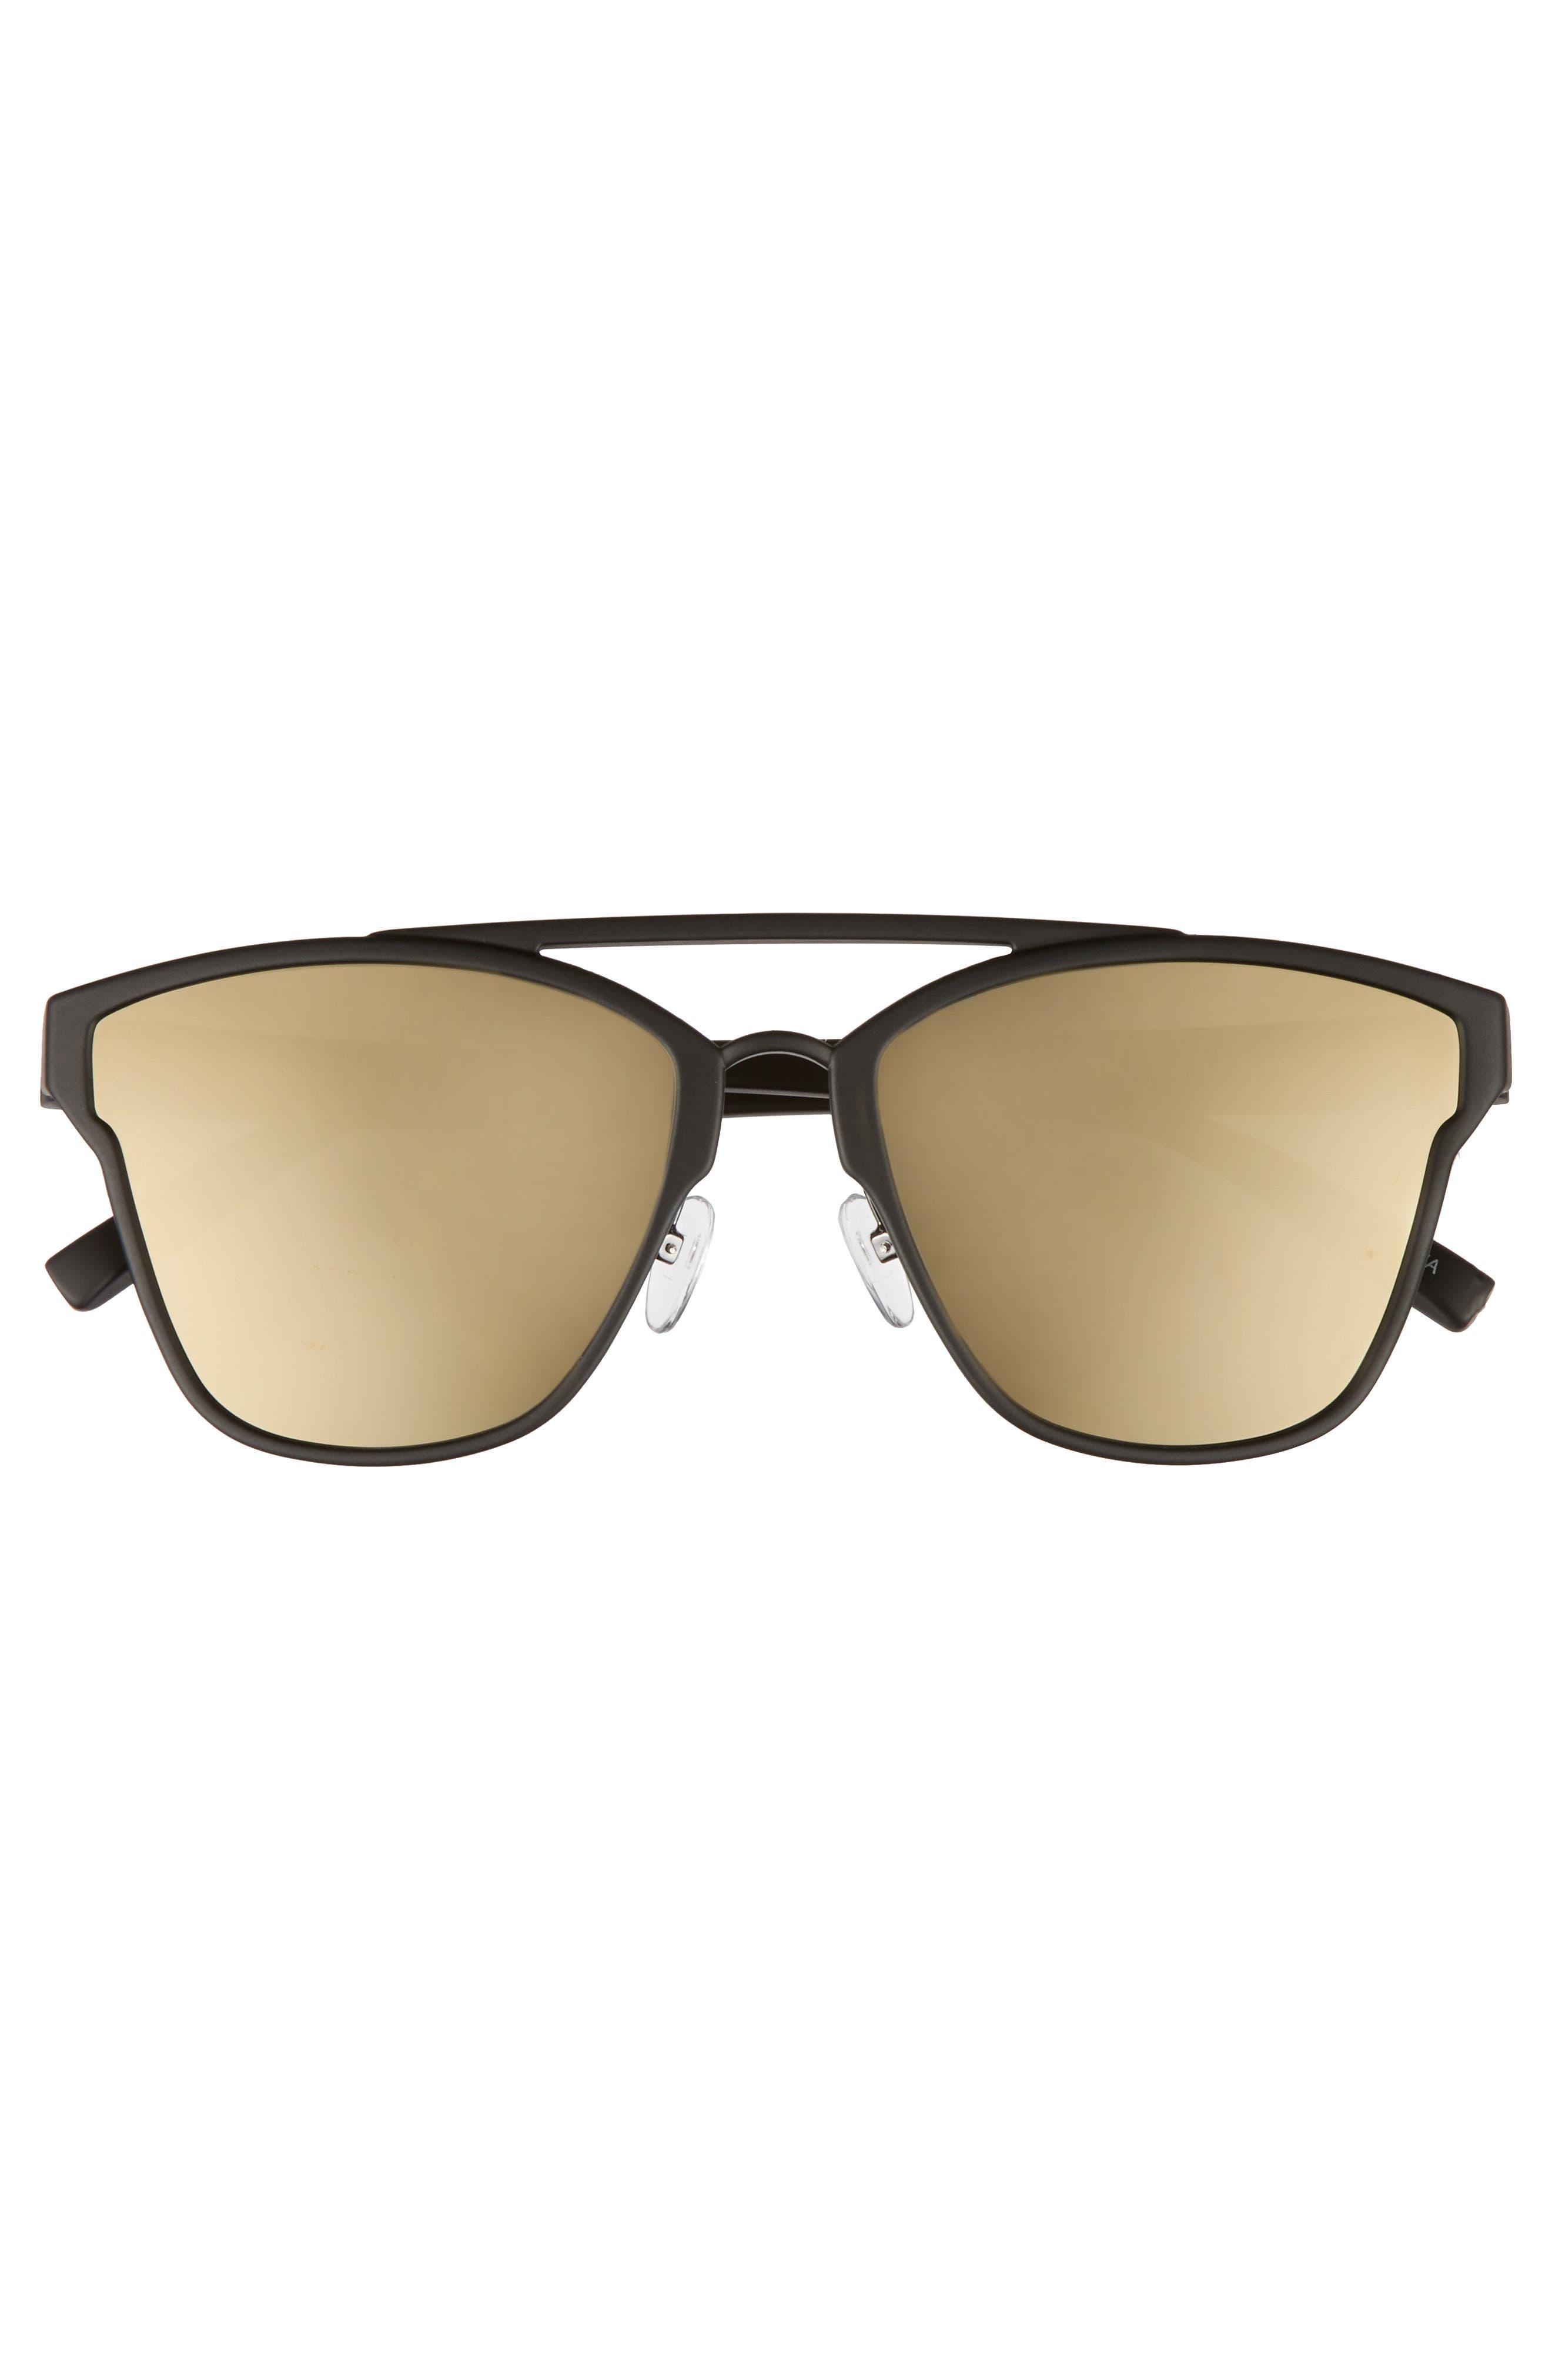 LE SPECS,                             Herstory 55mm Aviator Sunglasses,                             Alternate thumbnail 3, color,                             001